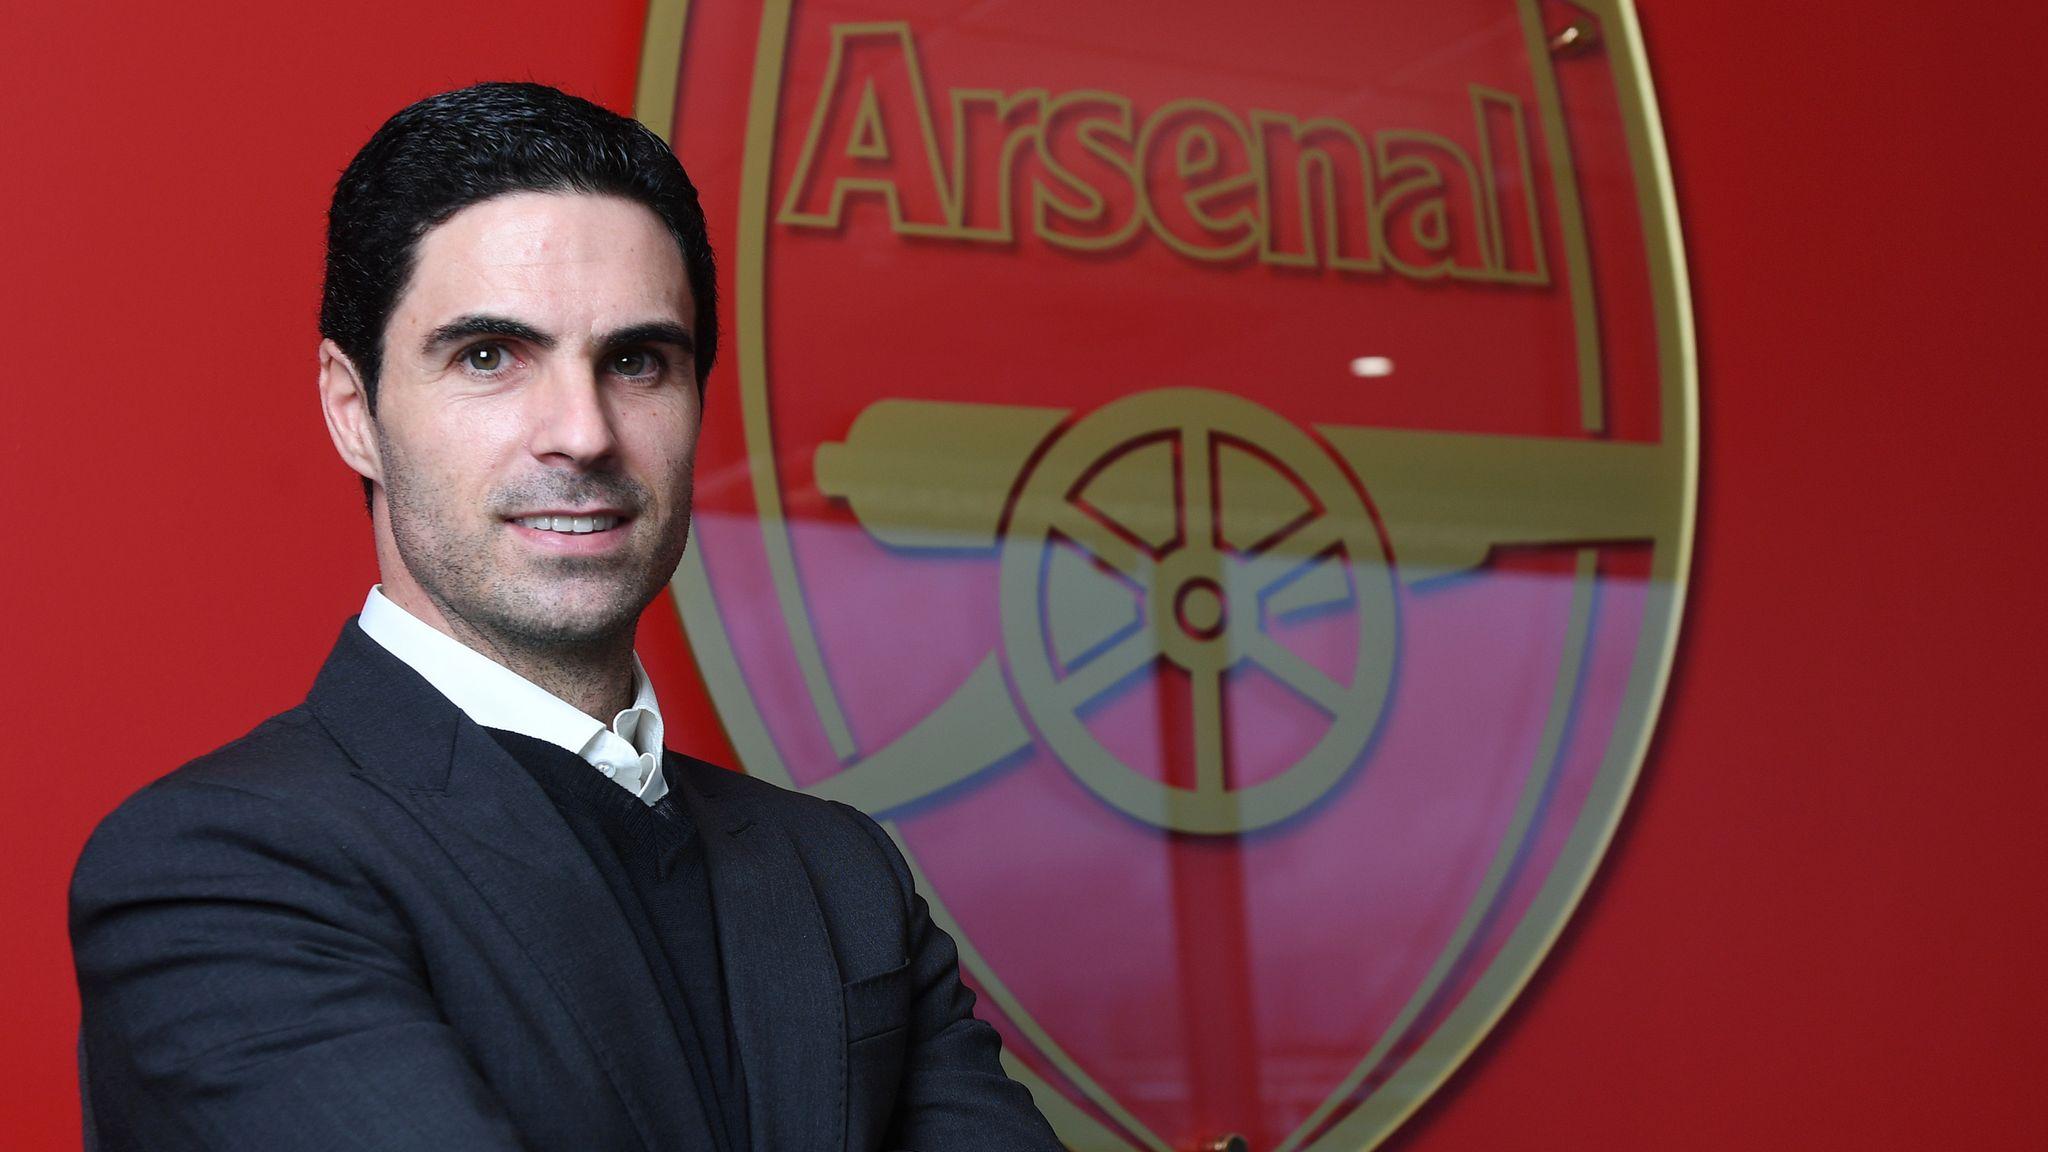 Mikel Arteta appointed Arsenal head coach | Football News | Sky Sports